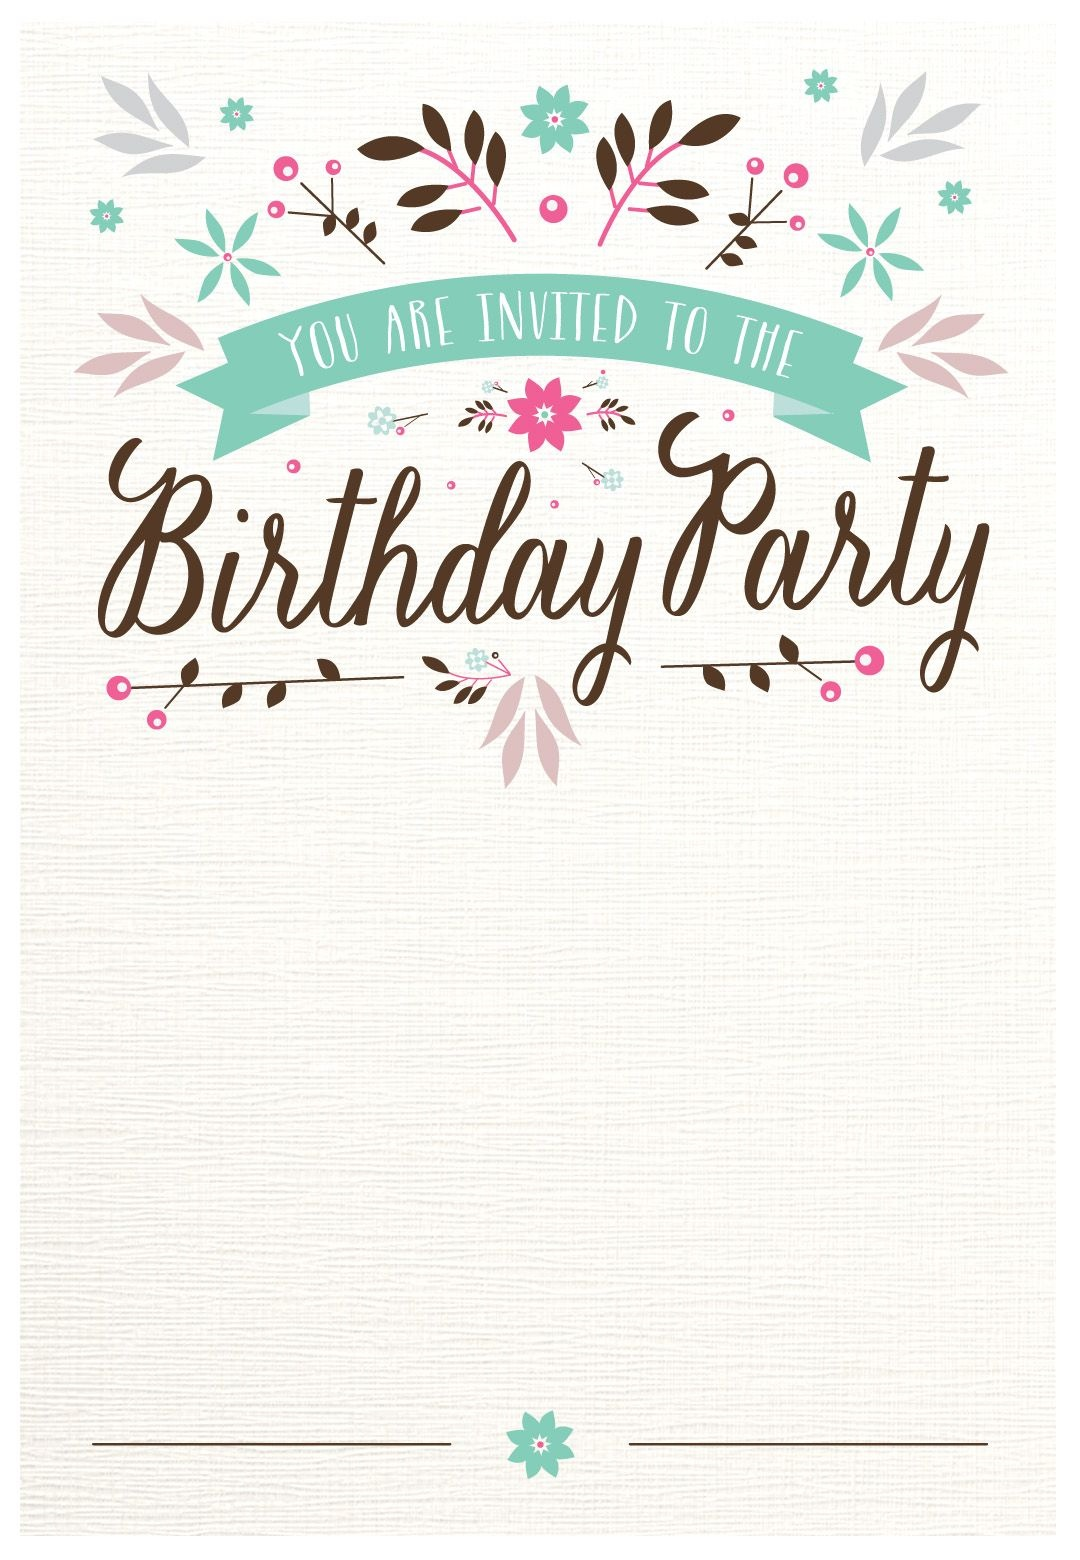 Flat Floral - Free Printable Birthday Invitation Template - Free Printable Event Invitations